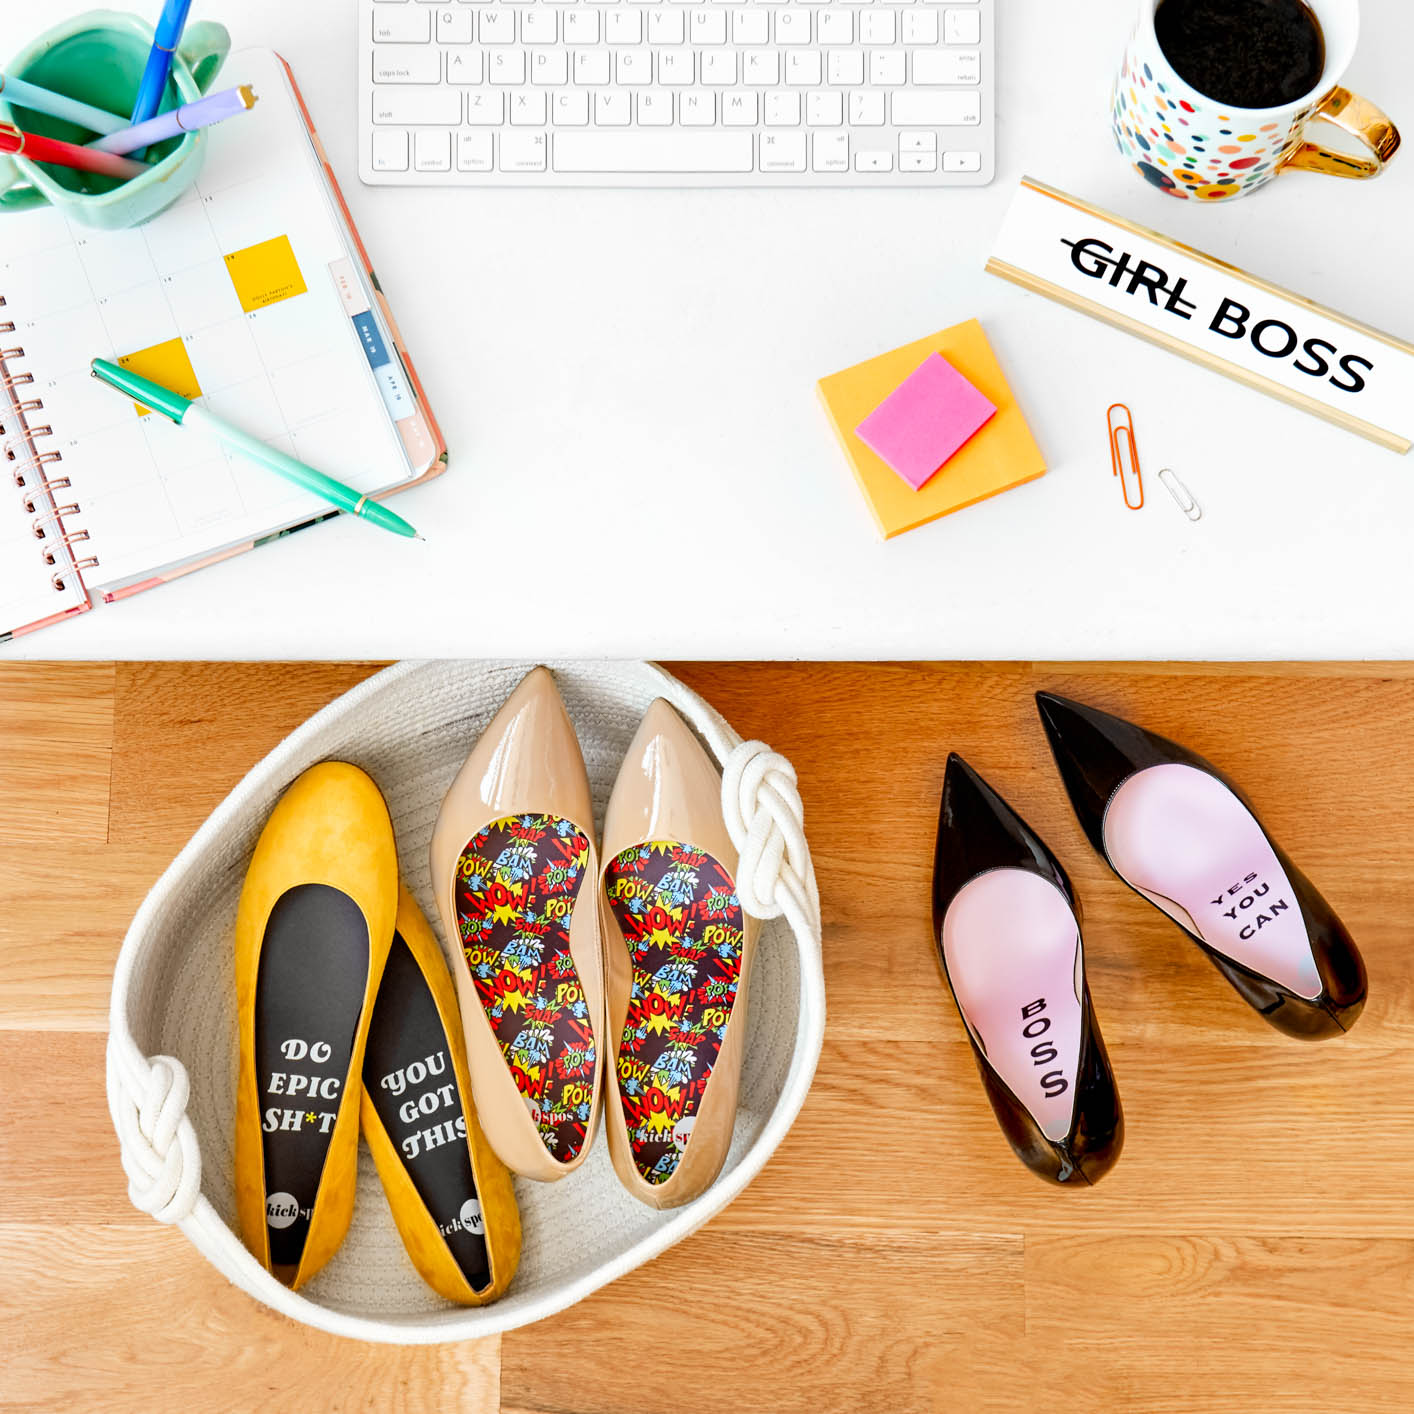 kickspos-brand-photography-shoes-insoles-4.jpg